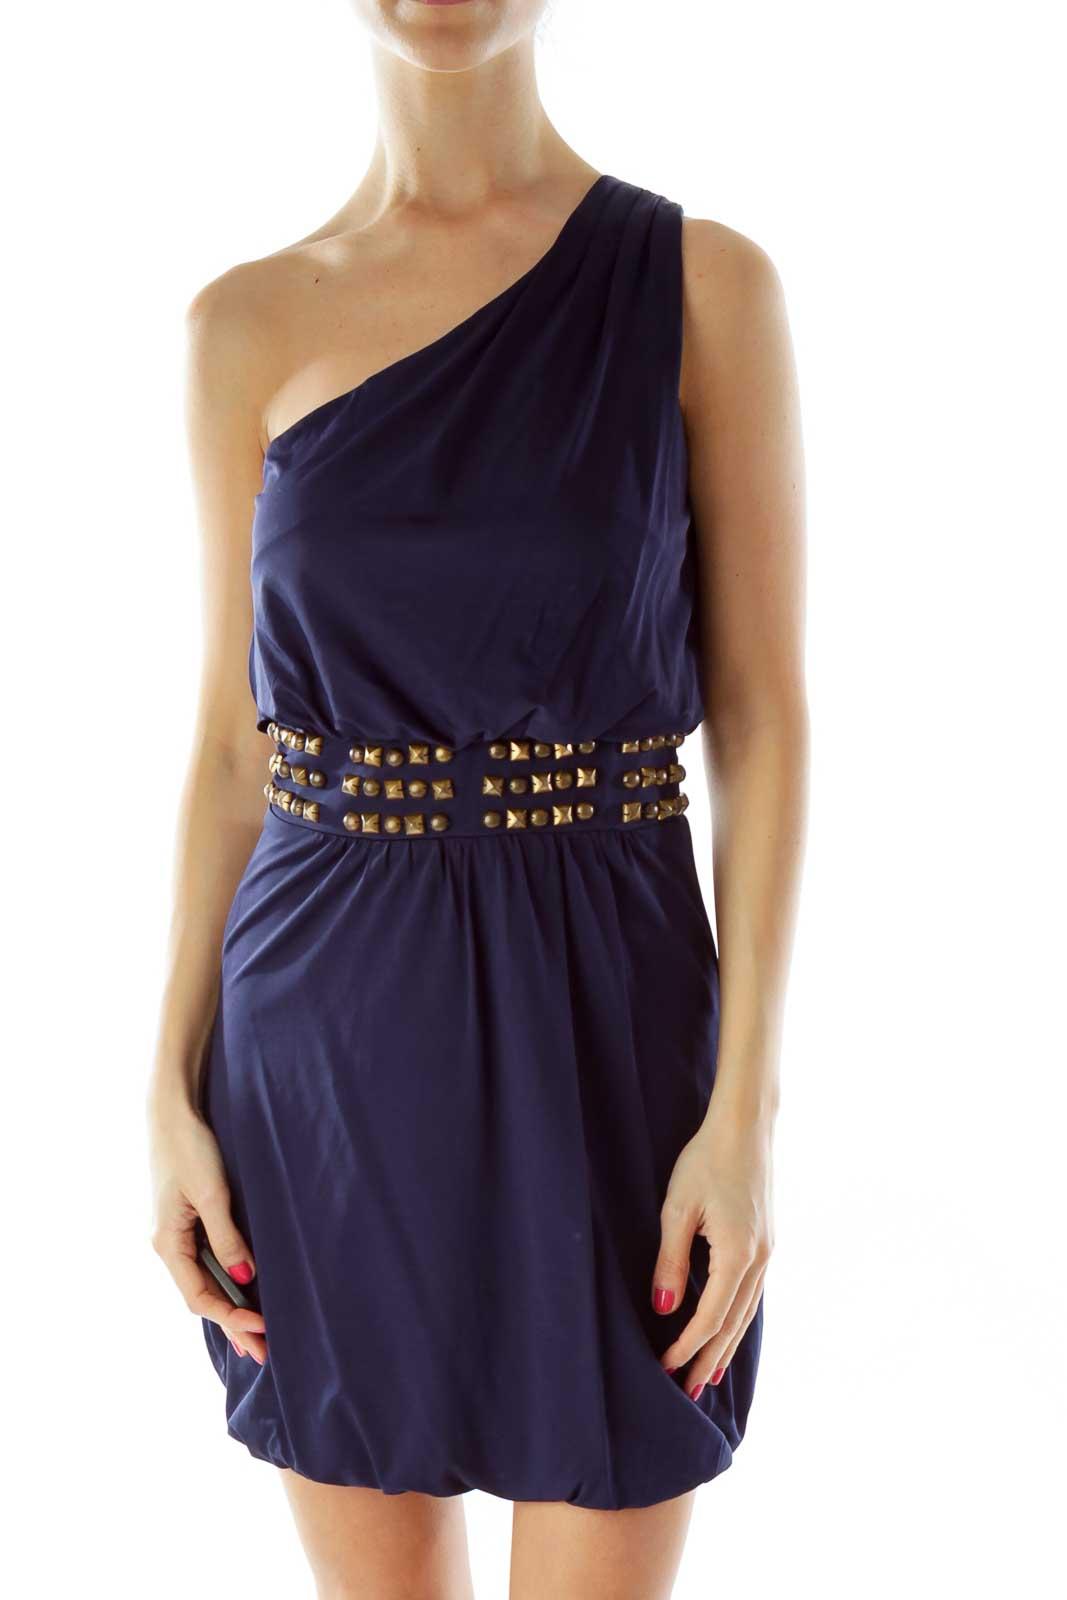 Blue Studded Cocktail Dress Front